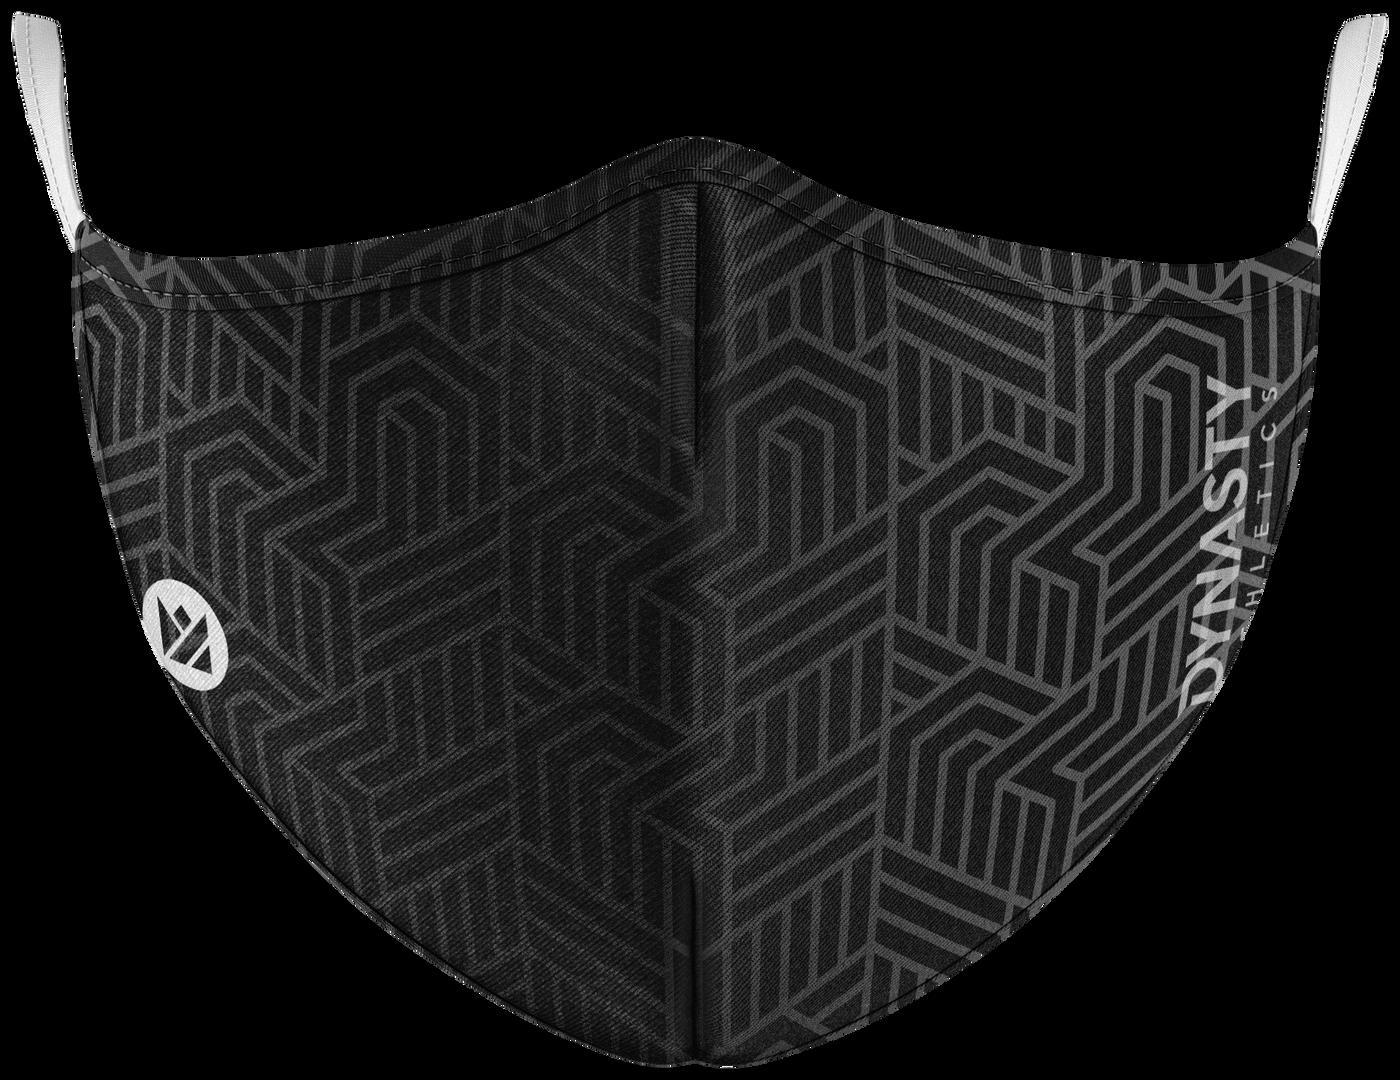 Monochrome Maze Mask Front.png